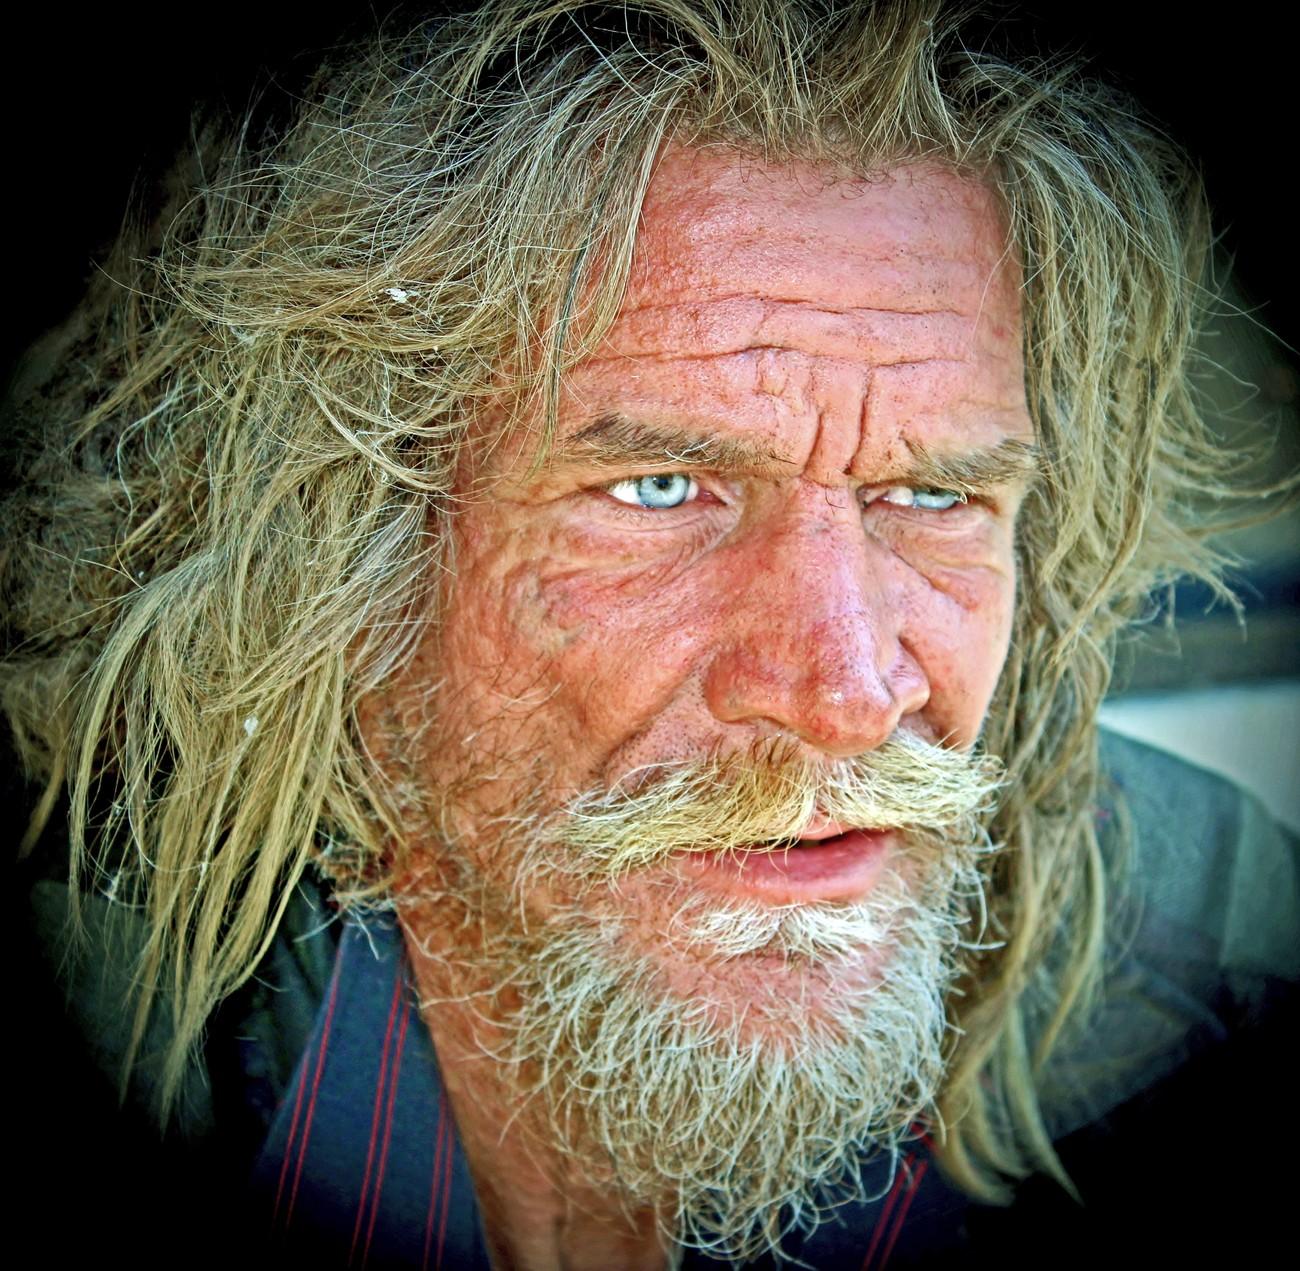 Hollywood Homeless Douglas